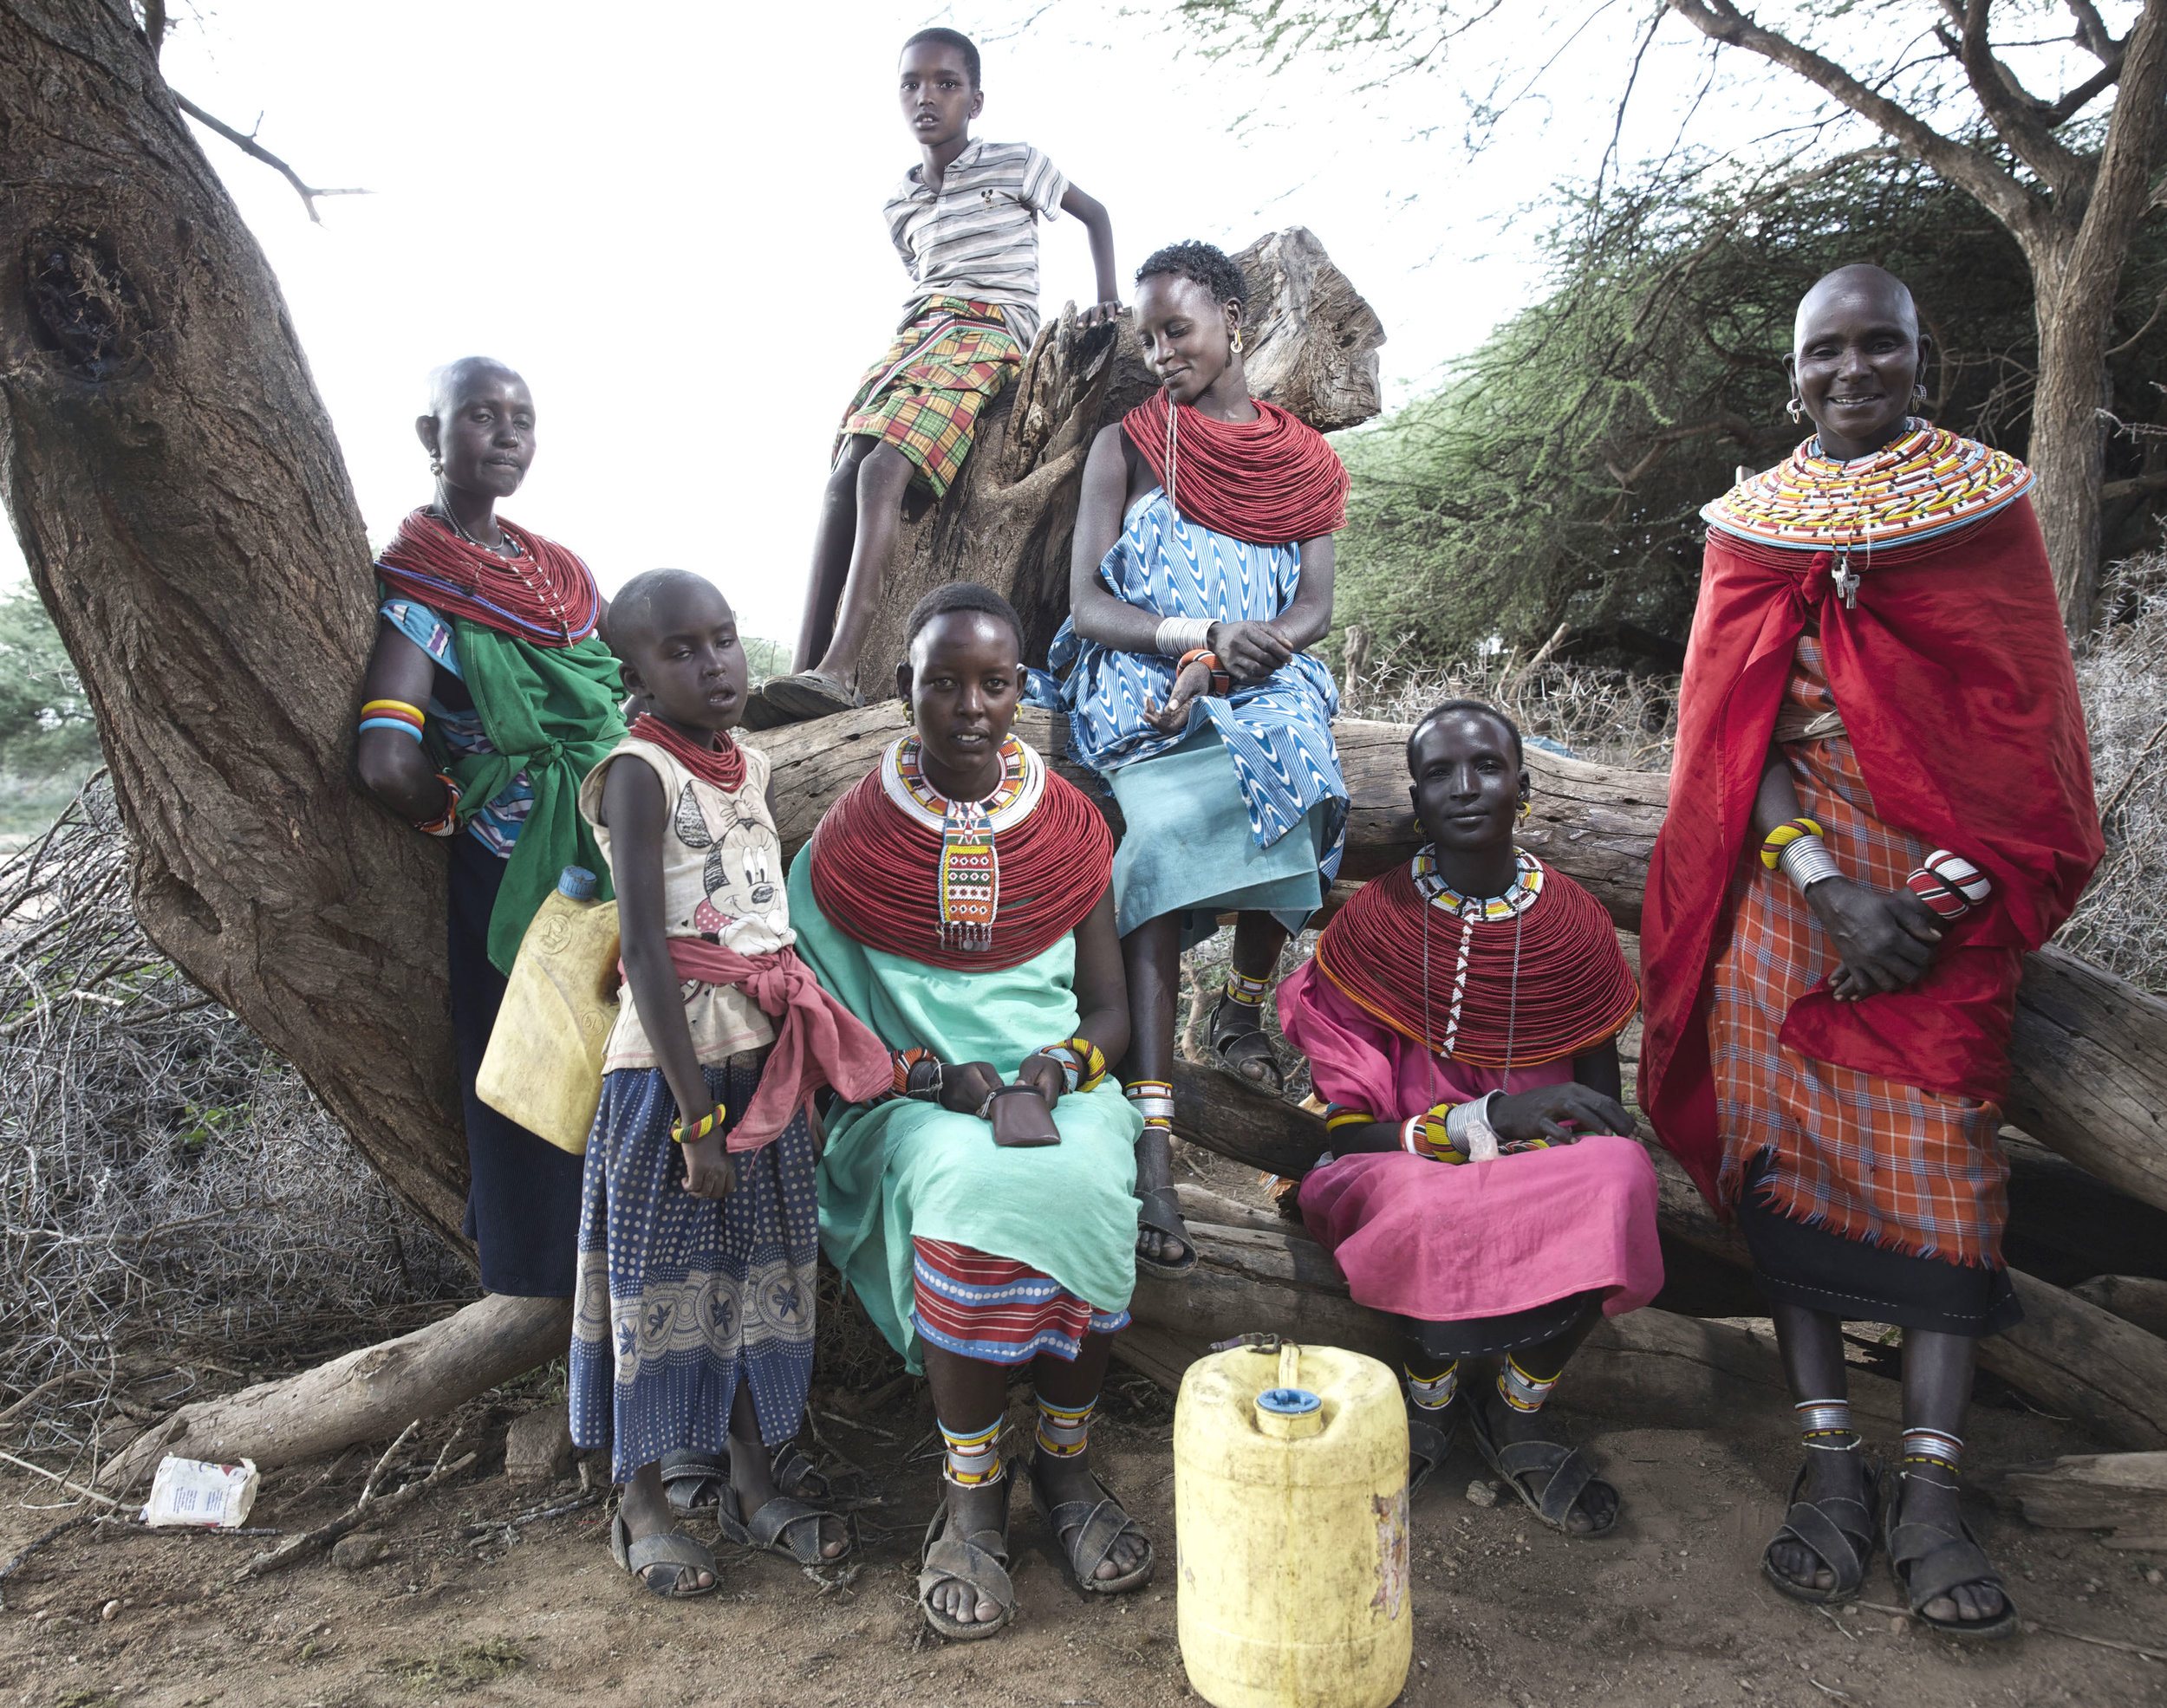 Women and Children in Samburu Kenya Africa